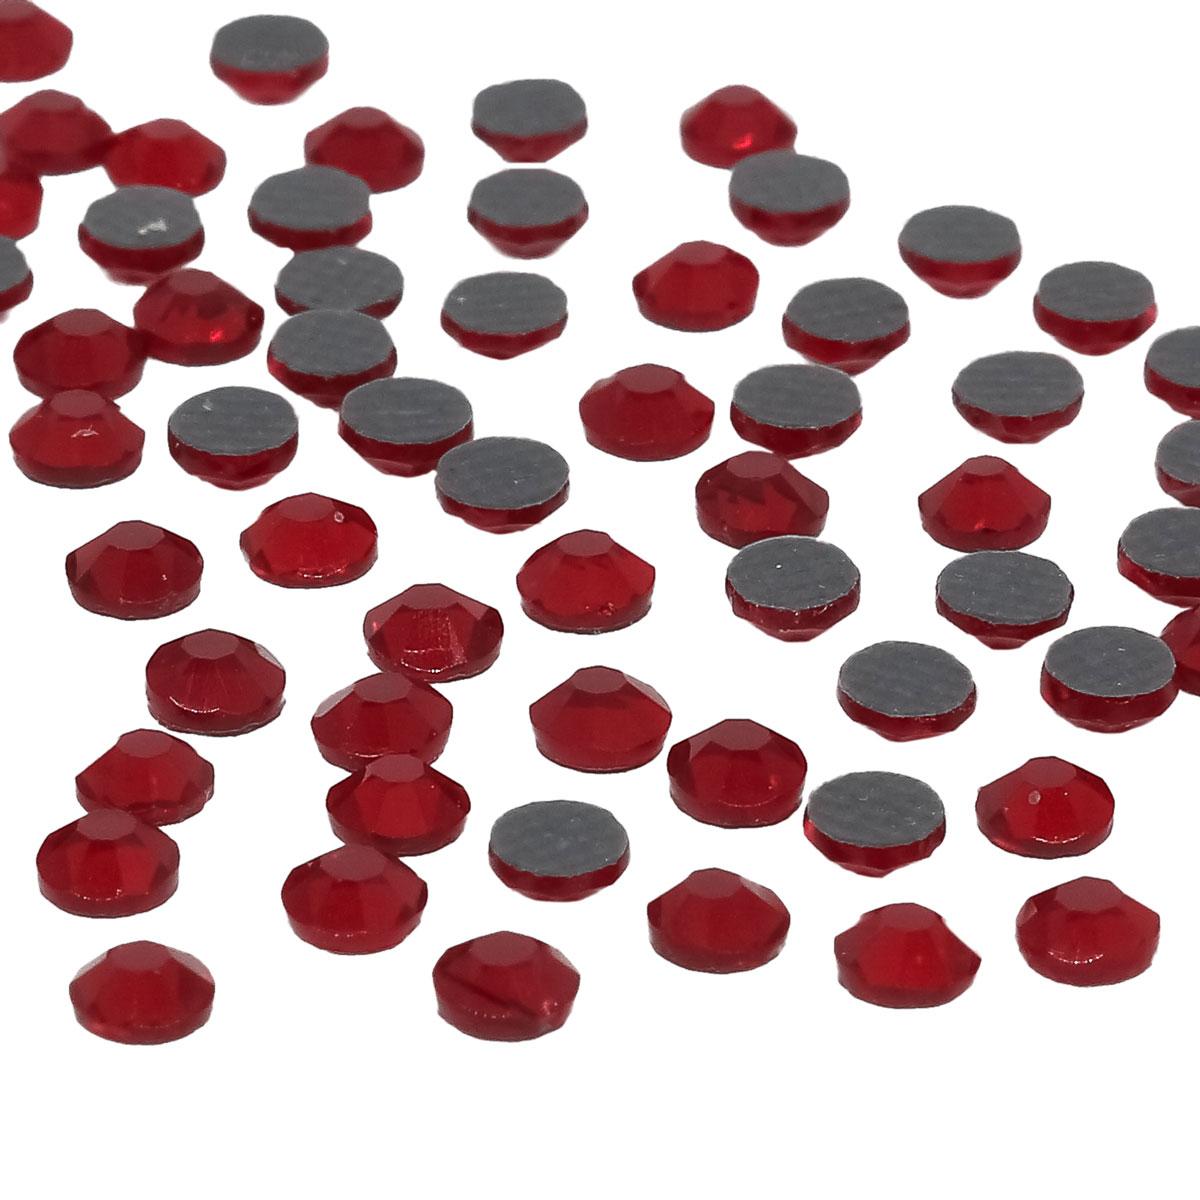 Стразы термоклеевые, 2,9мм, ss10, 288 шт/уп, Cristyle